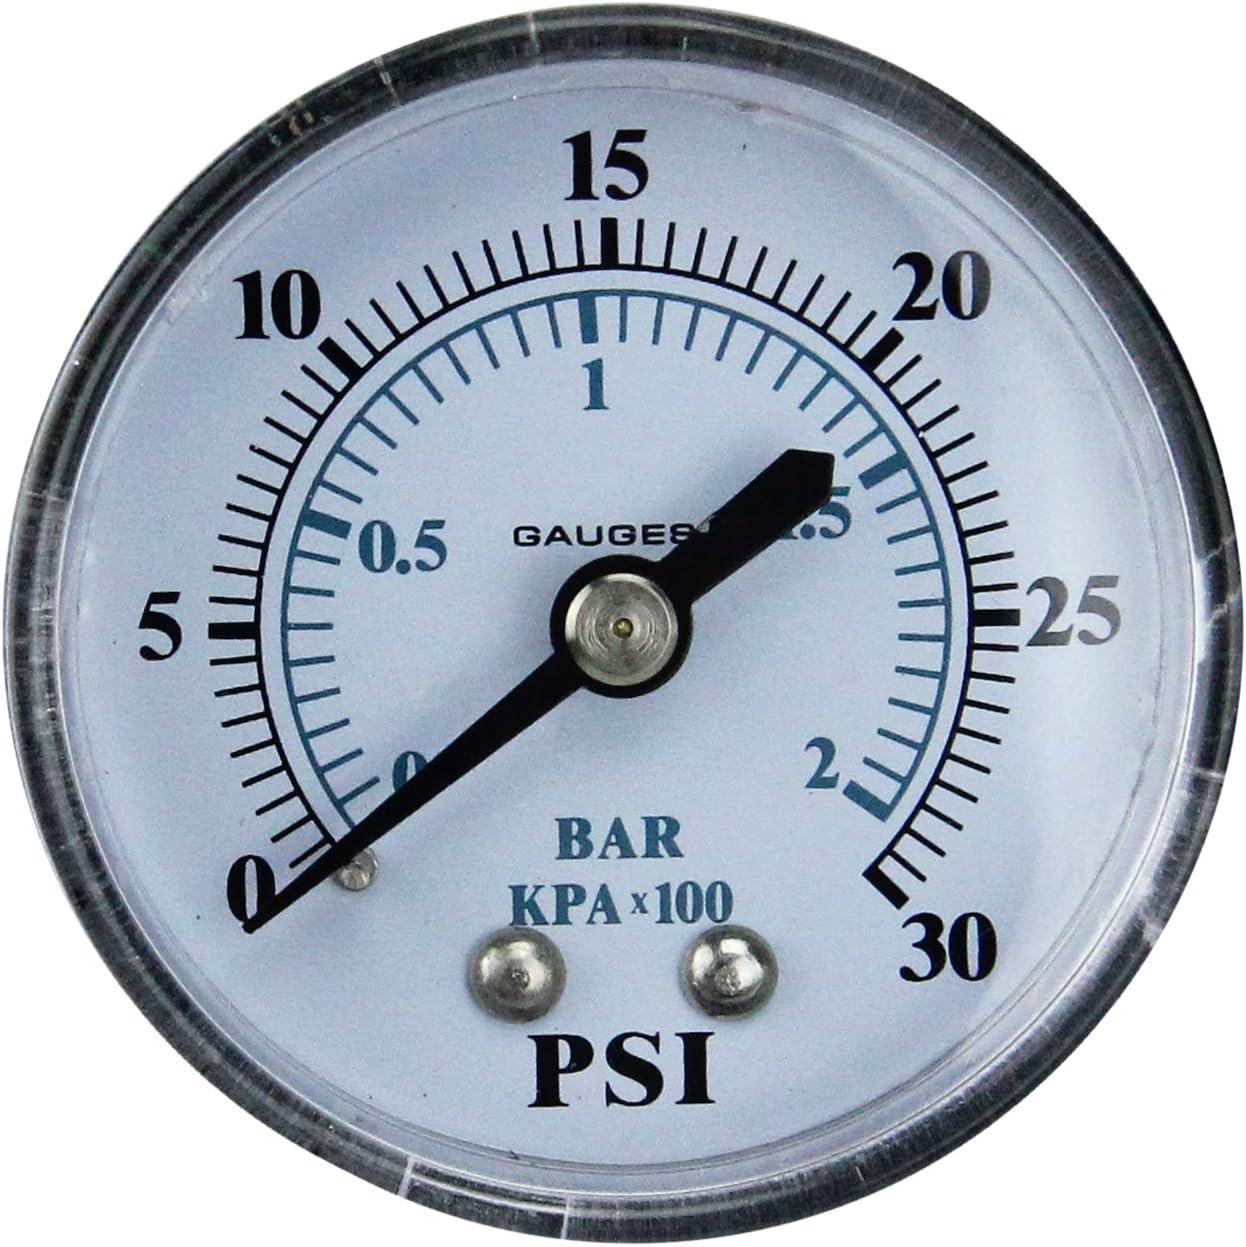 Pool Central 2 Black and White Side Mount Pressure Gauge 0-30 PSI